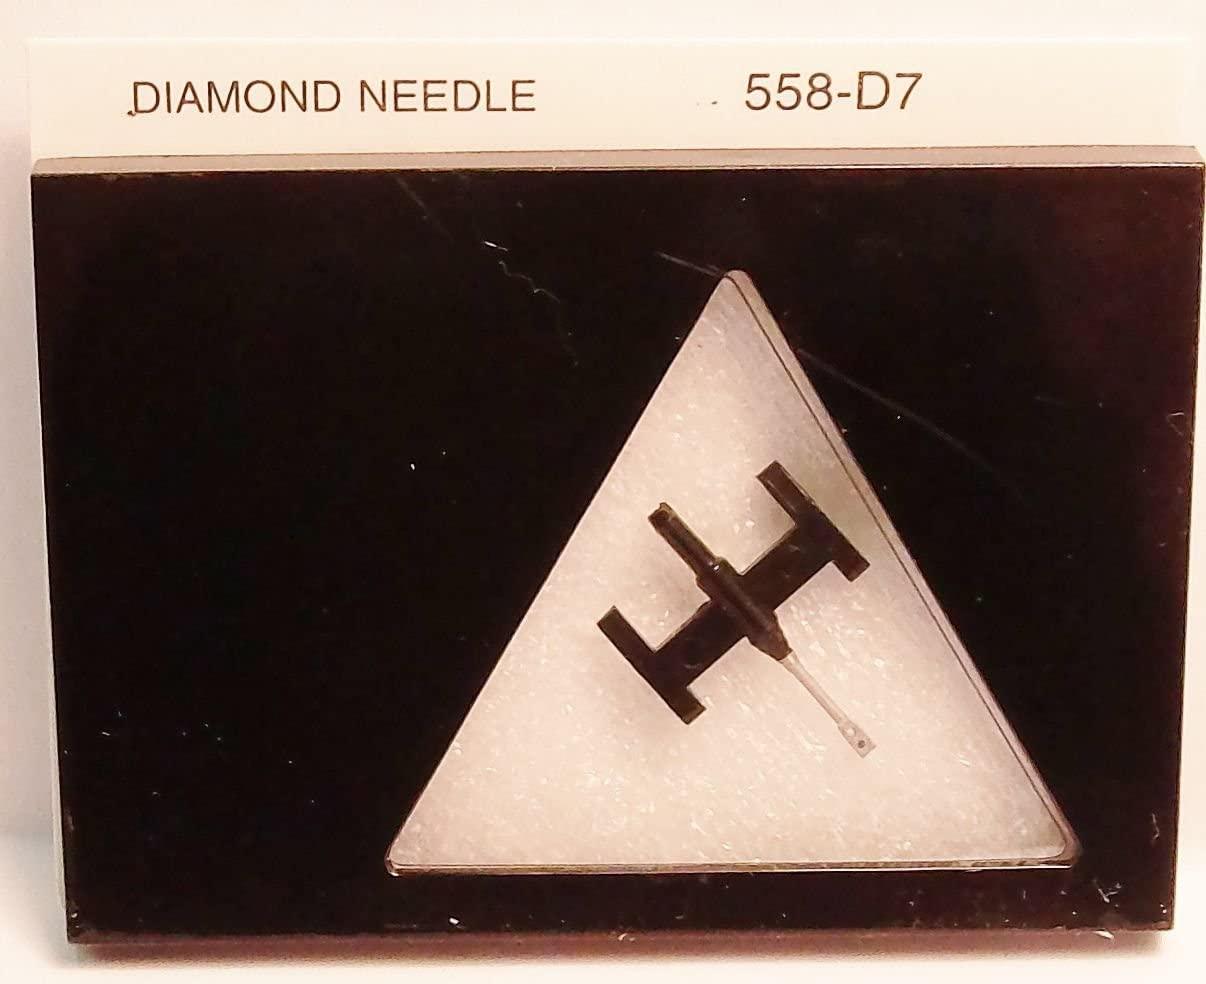 Durpower Phonograph Record Player Turntable Needle For Nivico ST-51, Sharp STY-132, Sanyo ST-170, Sanyo STG-5, Toshiba N-40C, Toshiba SM-2880